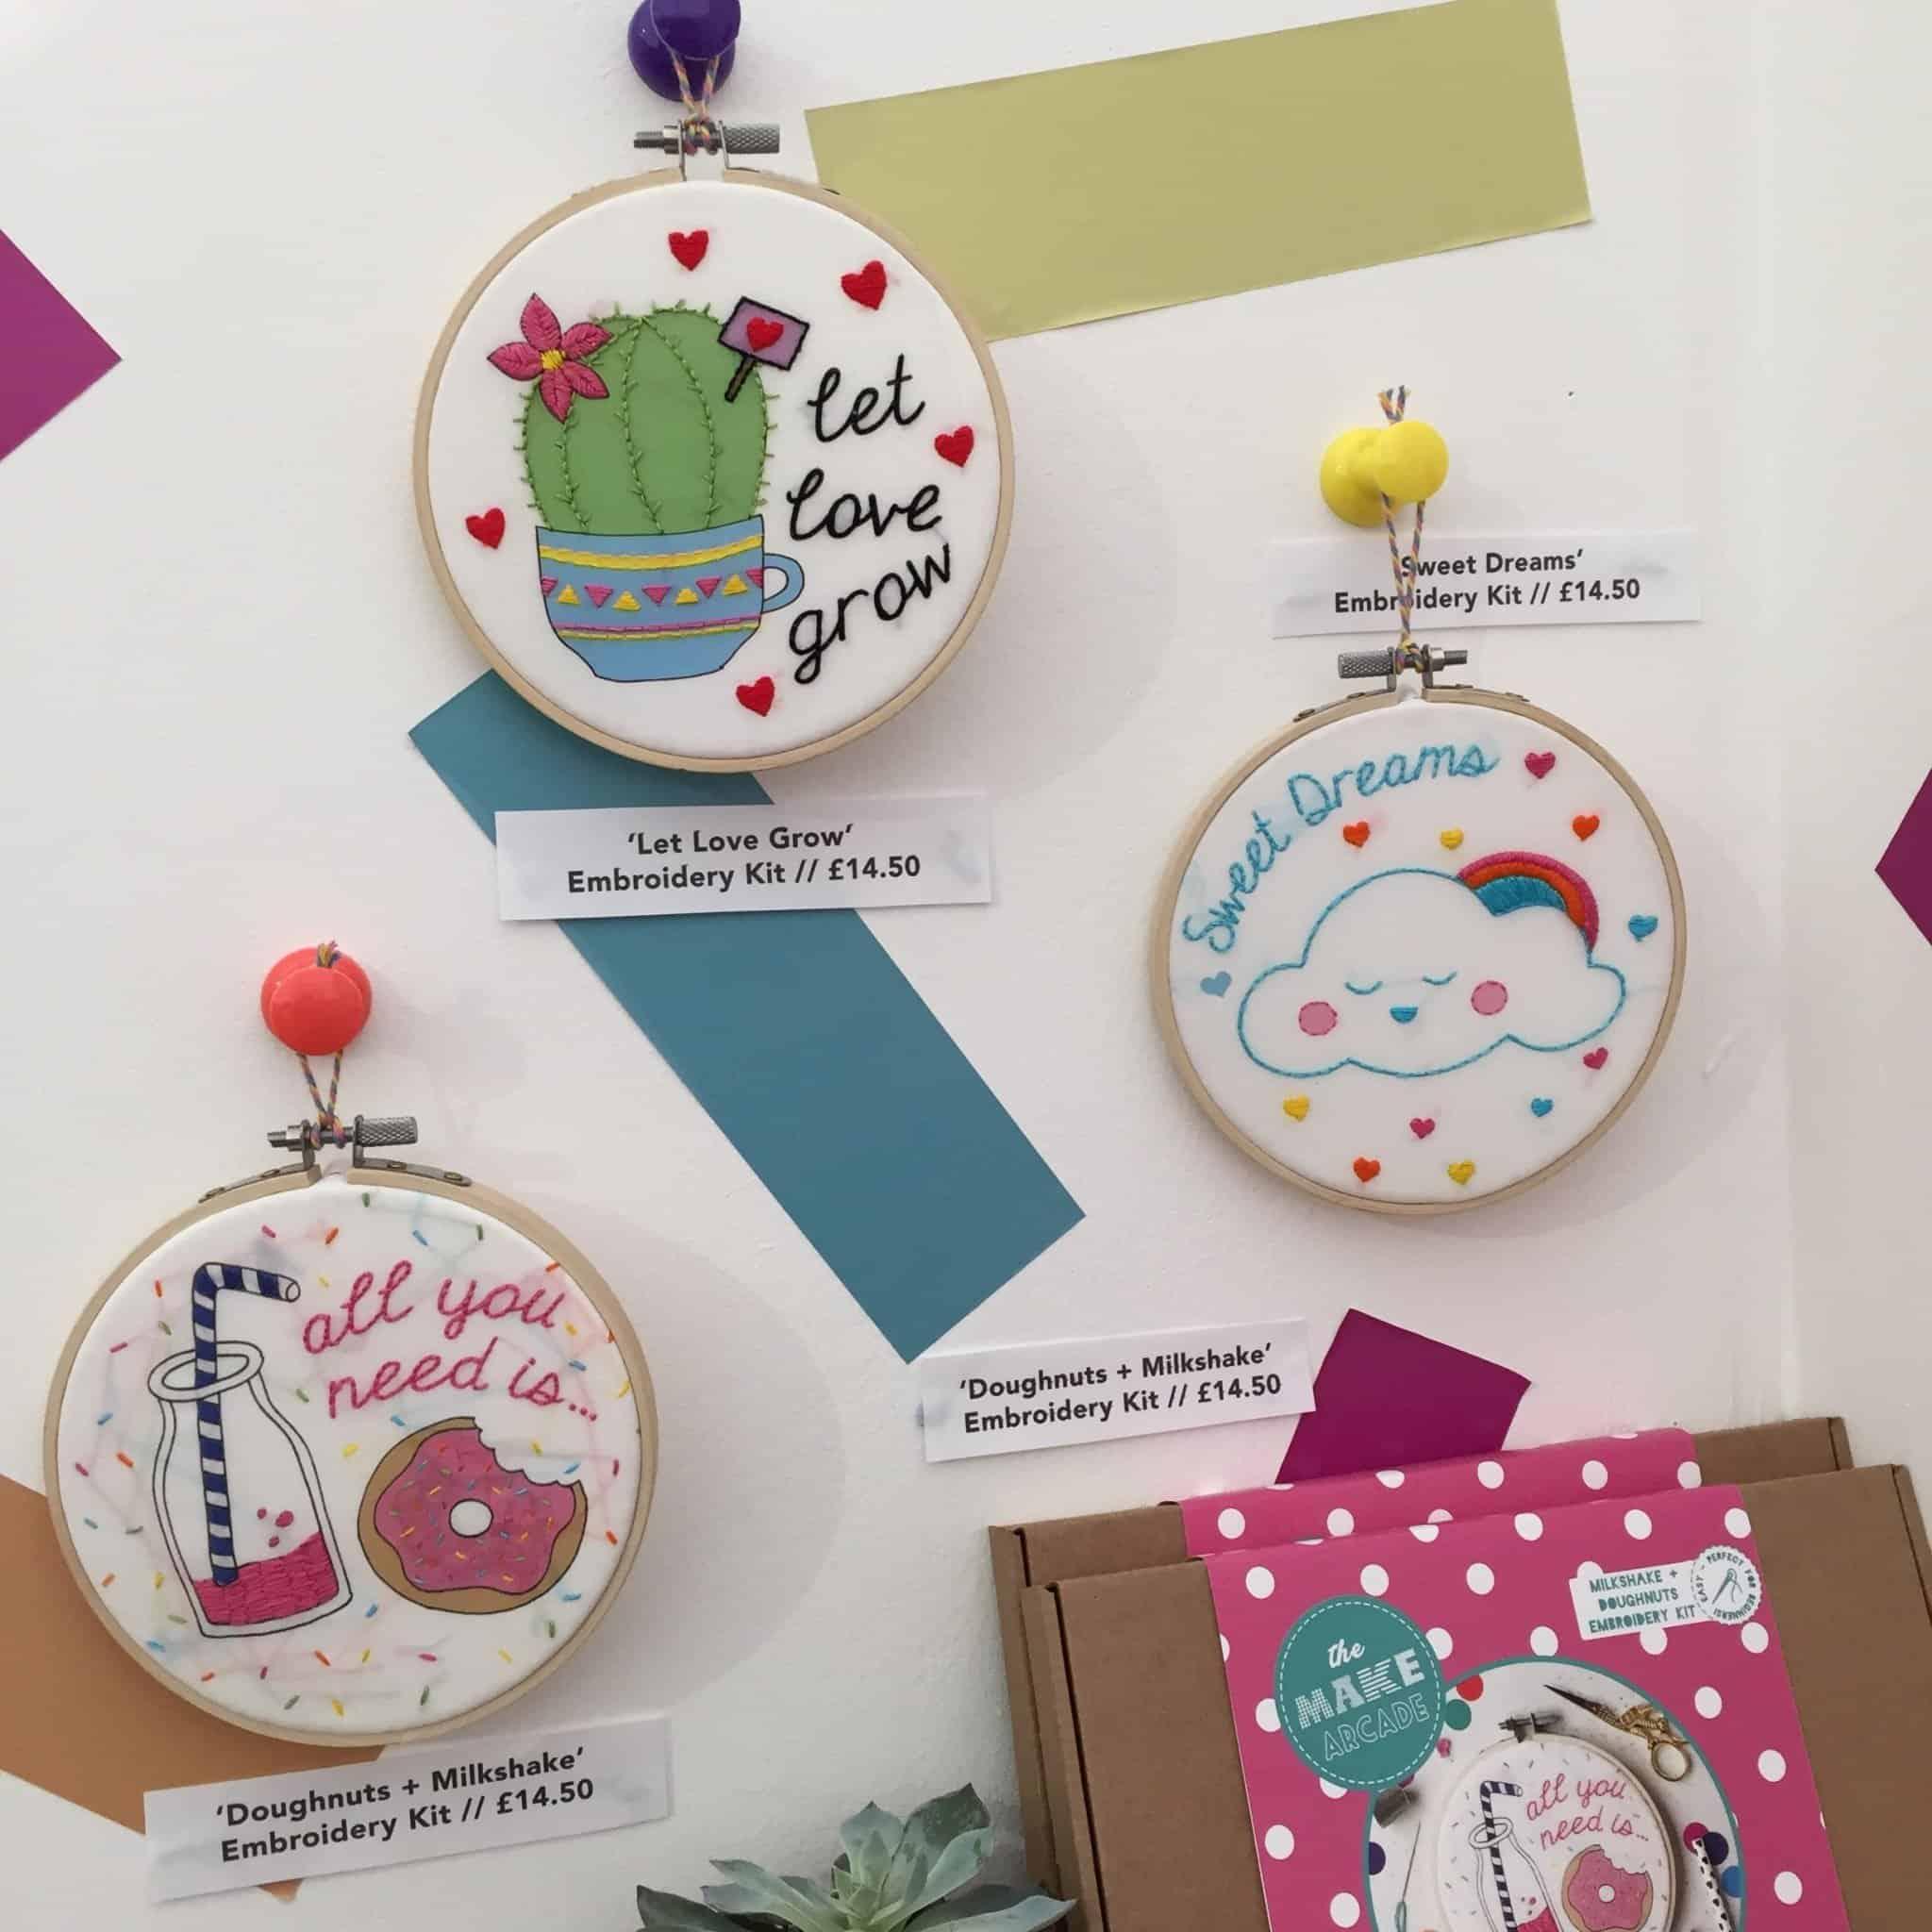 The Make Arcade Embroidery at The Handmade Fair